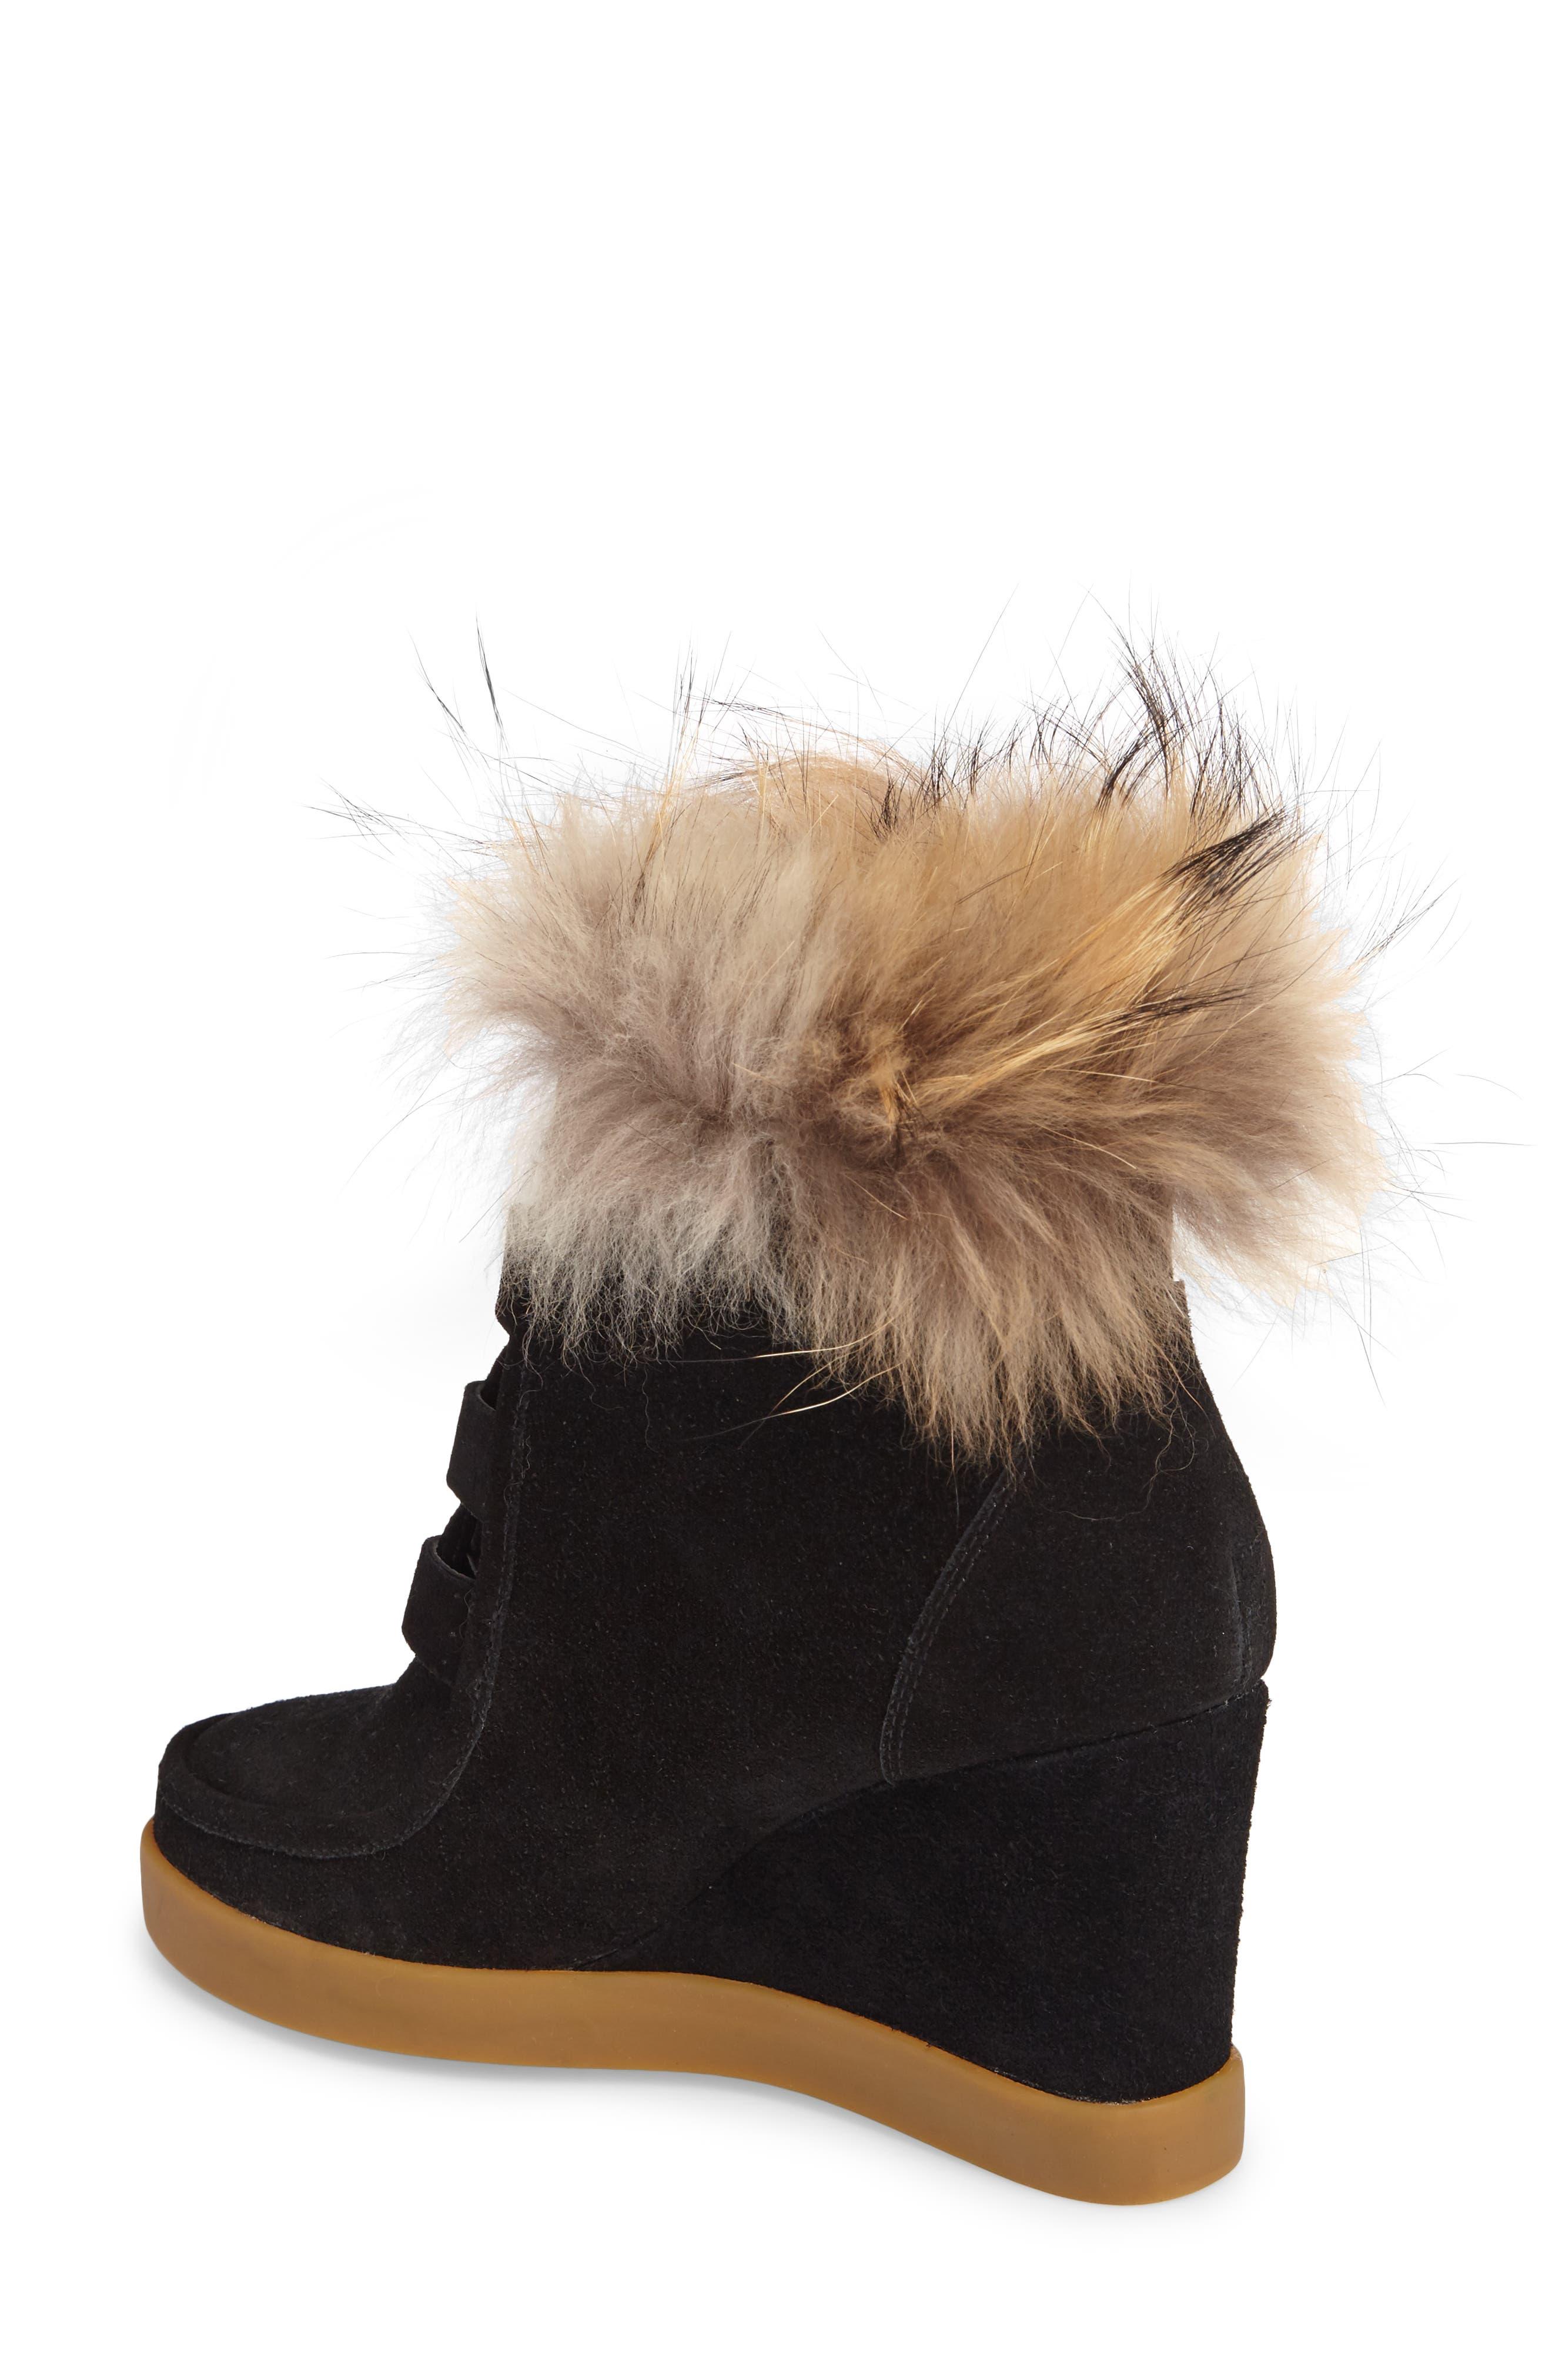 Alternate Image 2  - Cecelia New York Holly Wedge Bootie with Genuine Fox Fur Trim (Women)